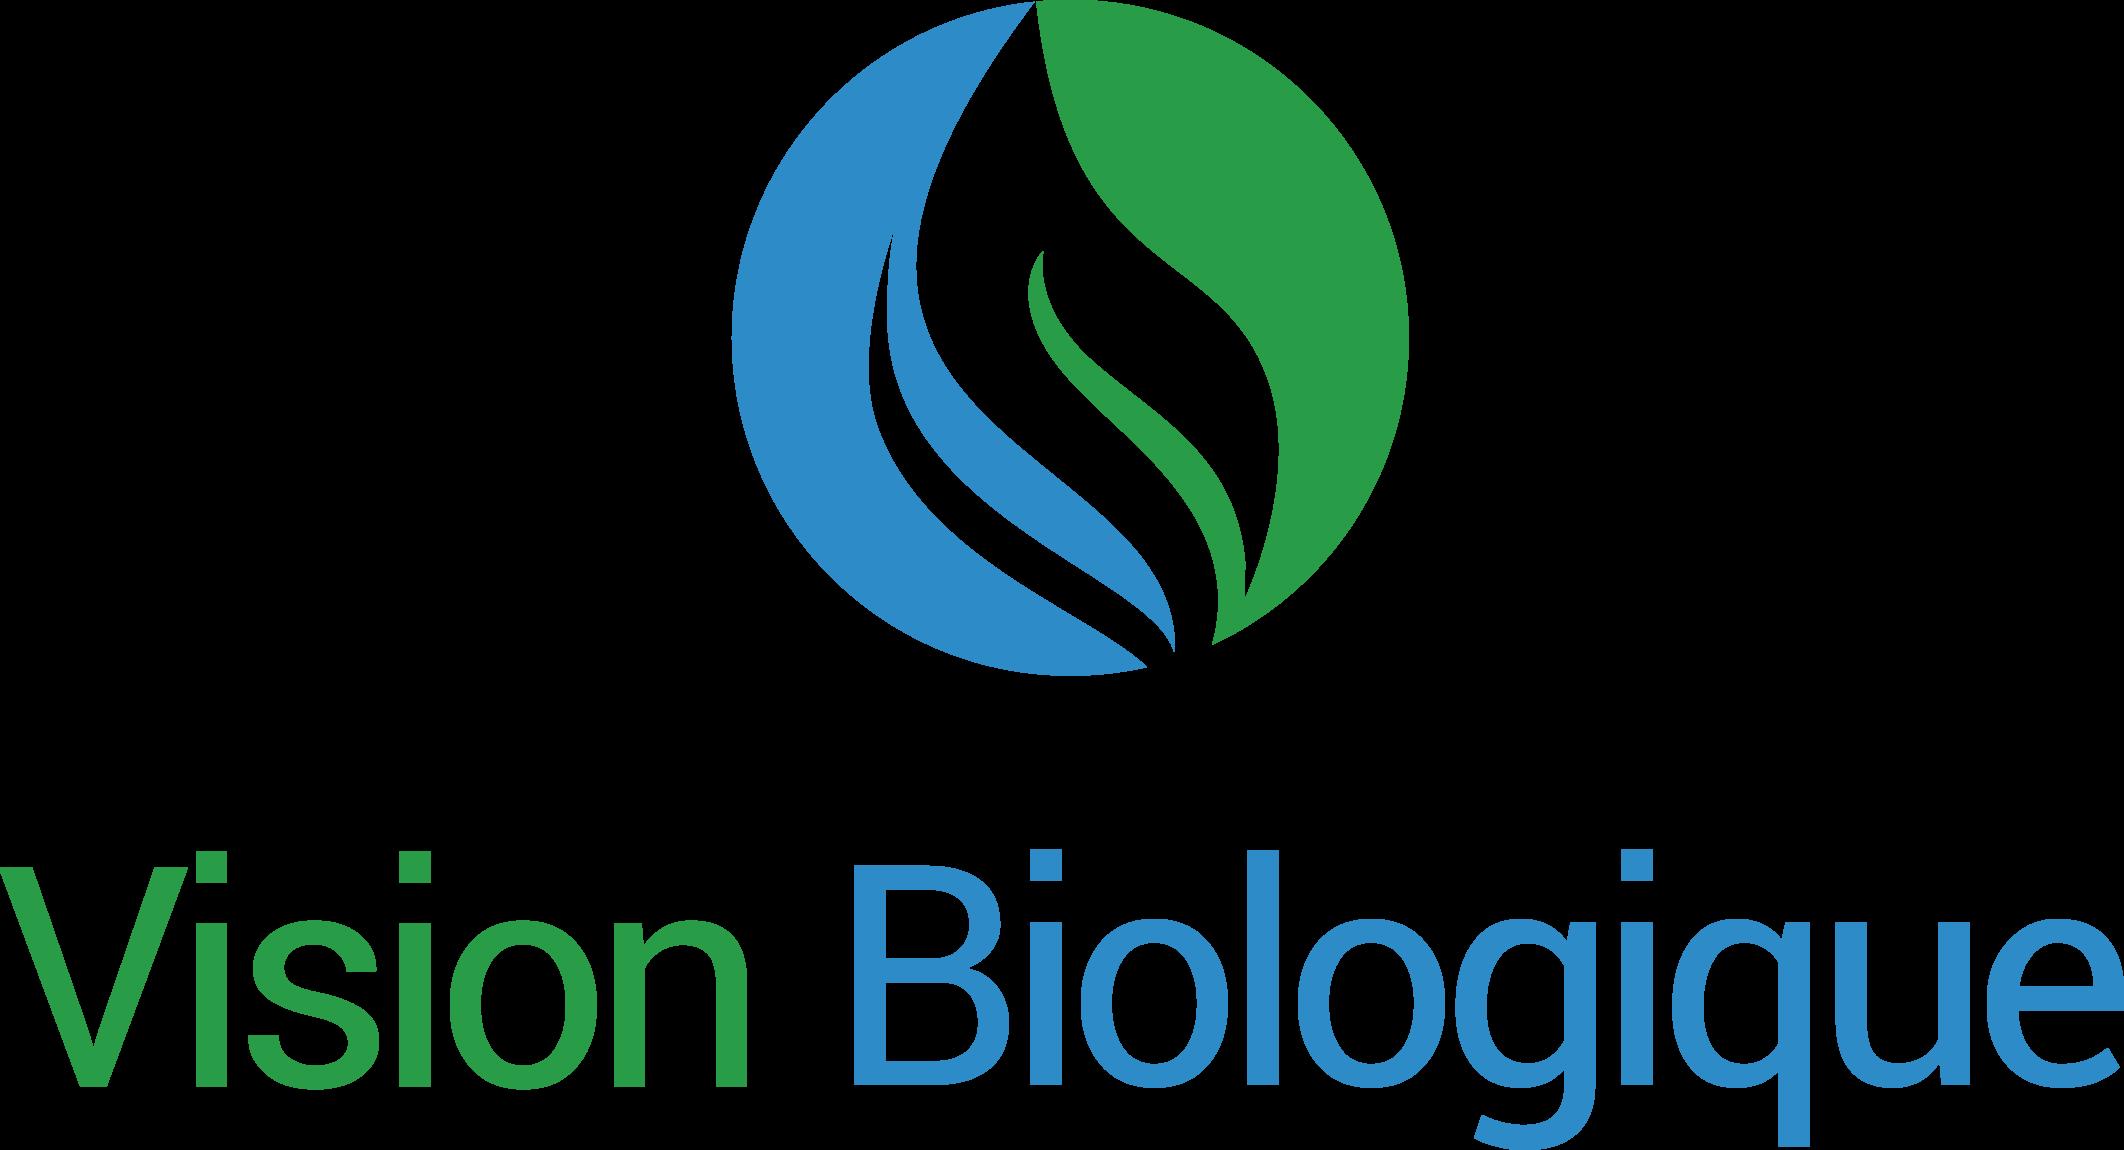 Vision Biologique